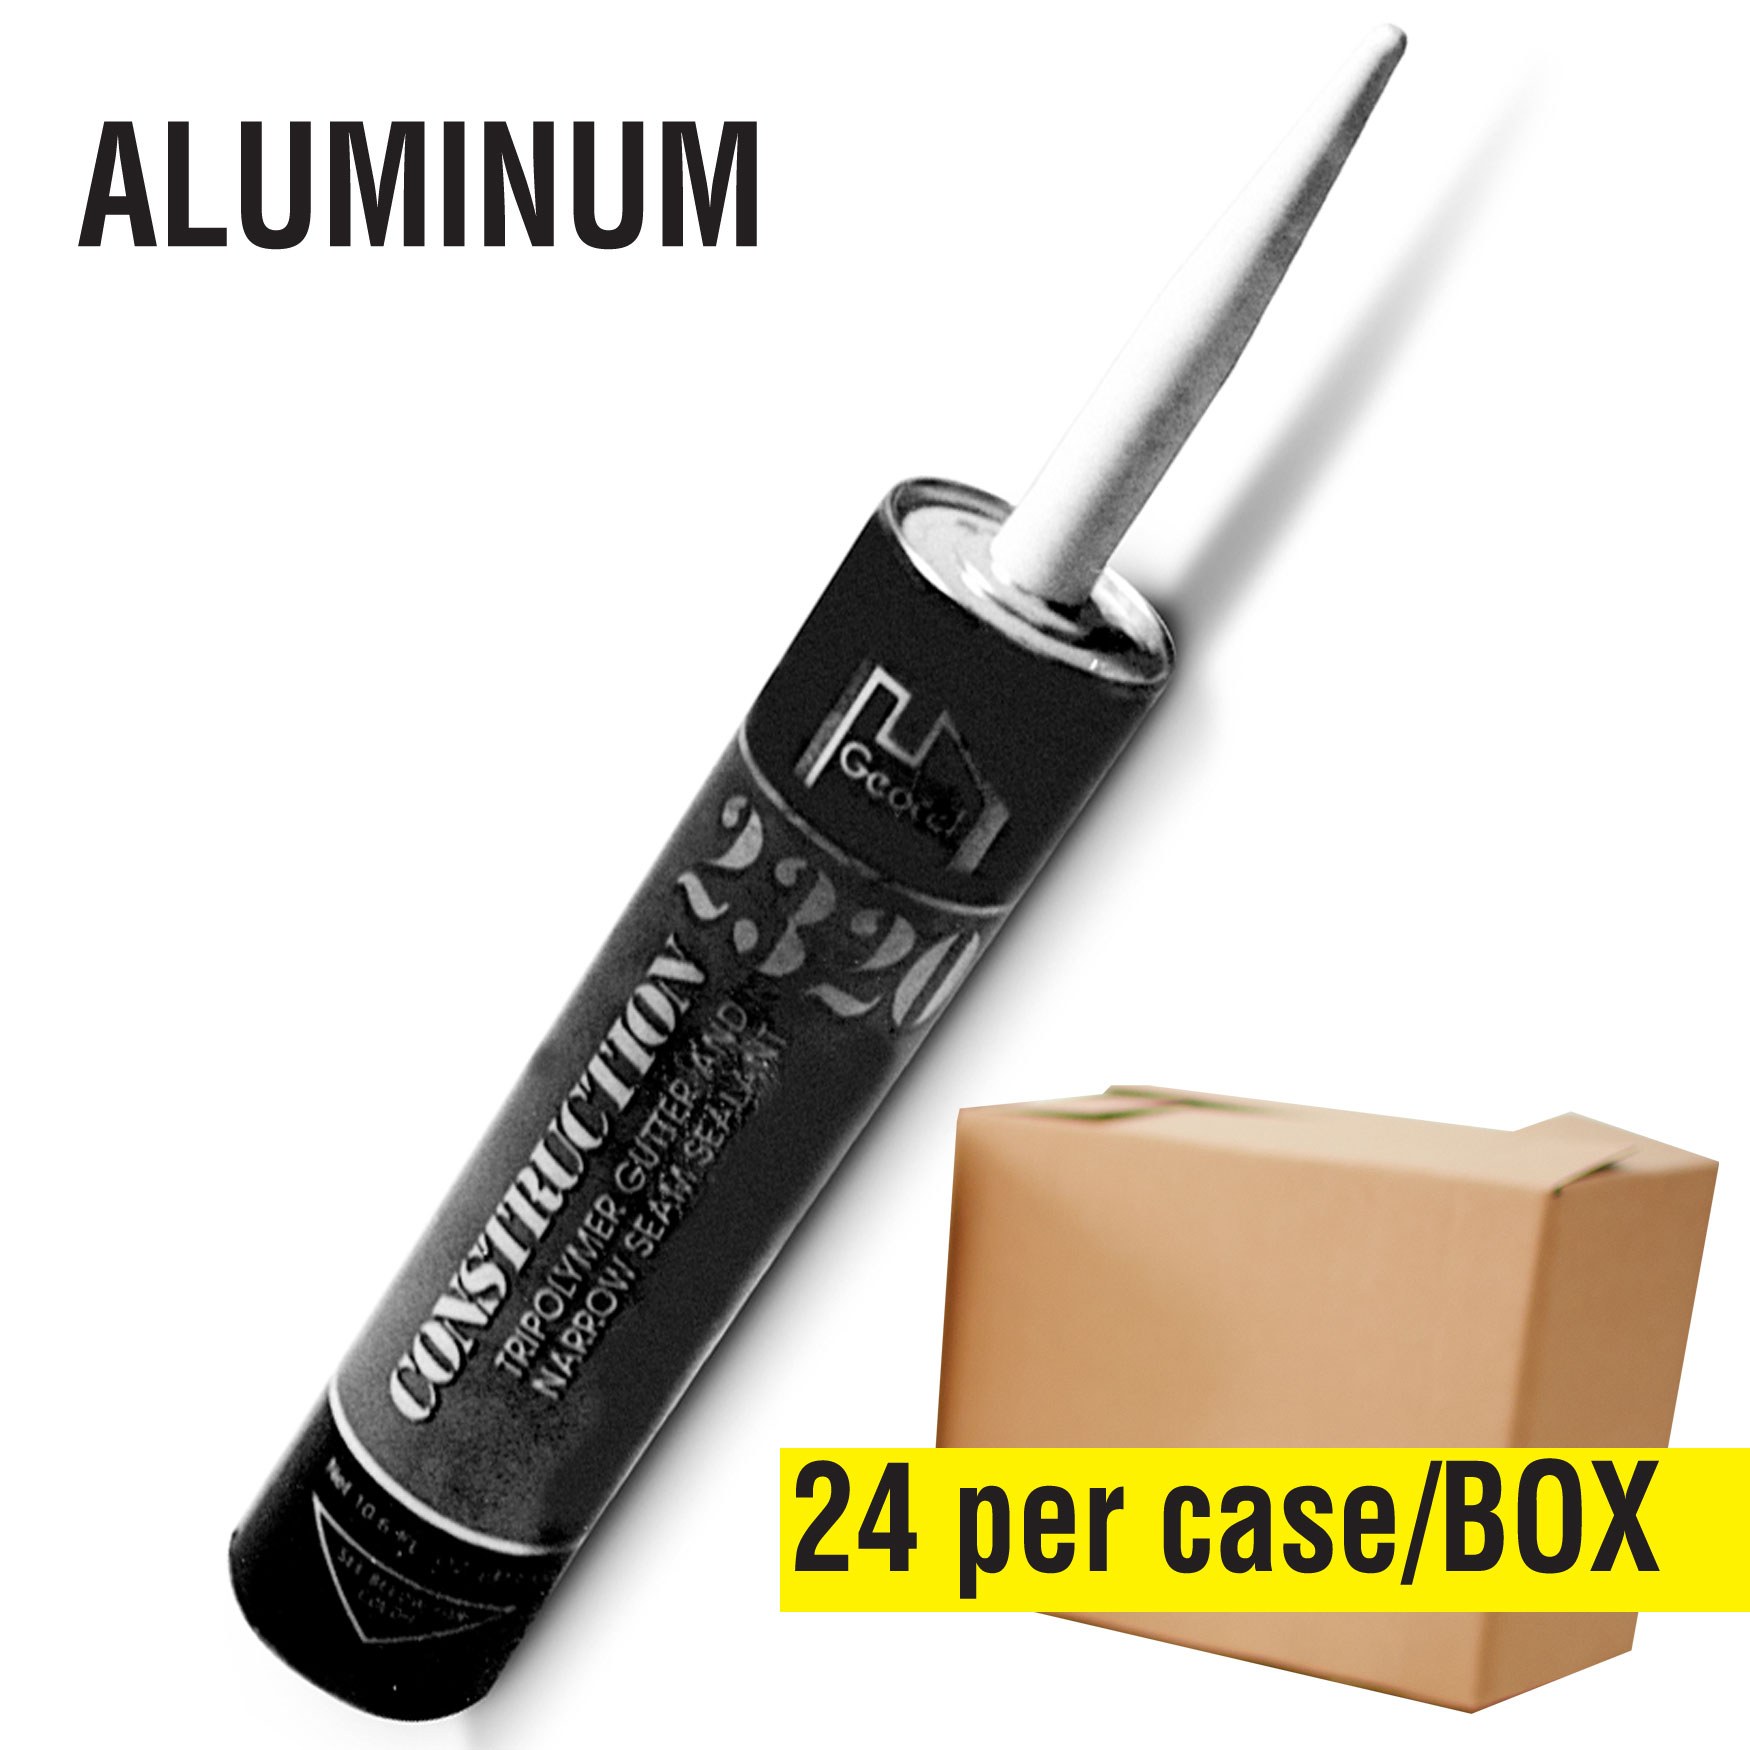 Geocel 2320 - Aluminum